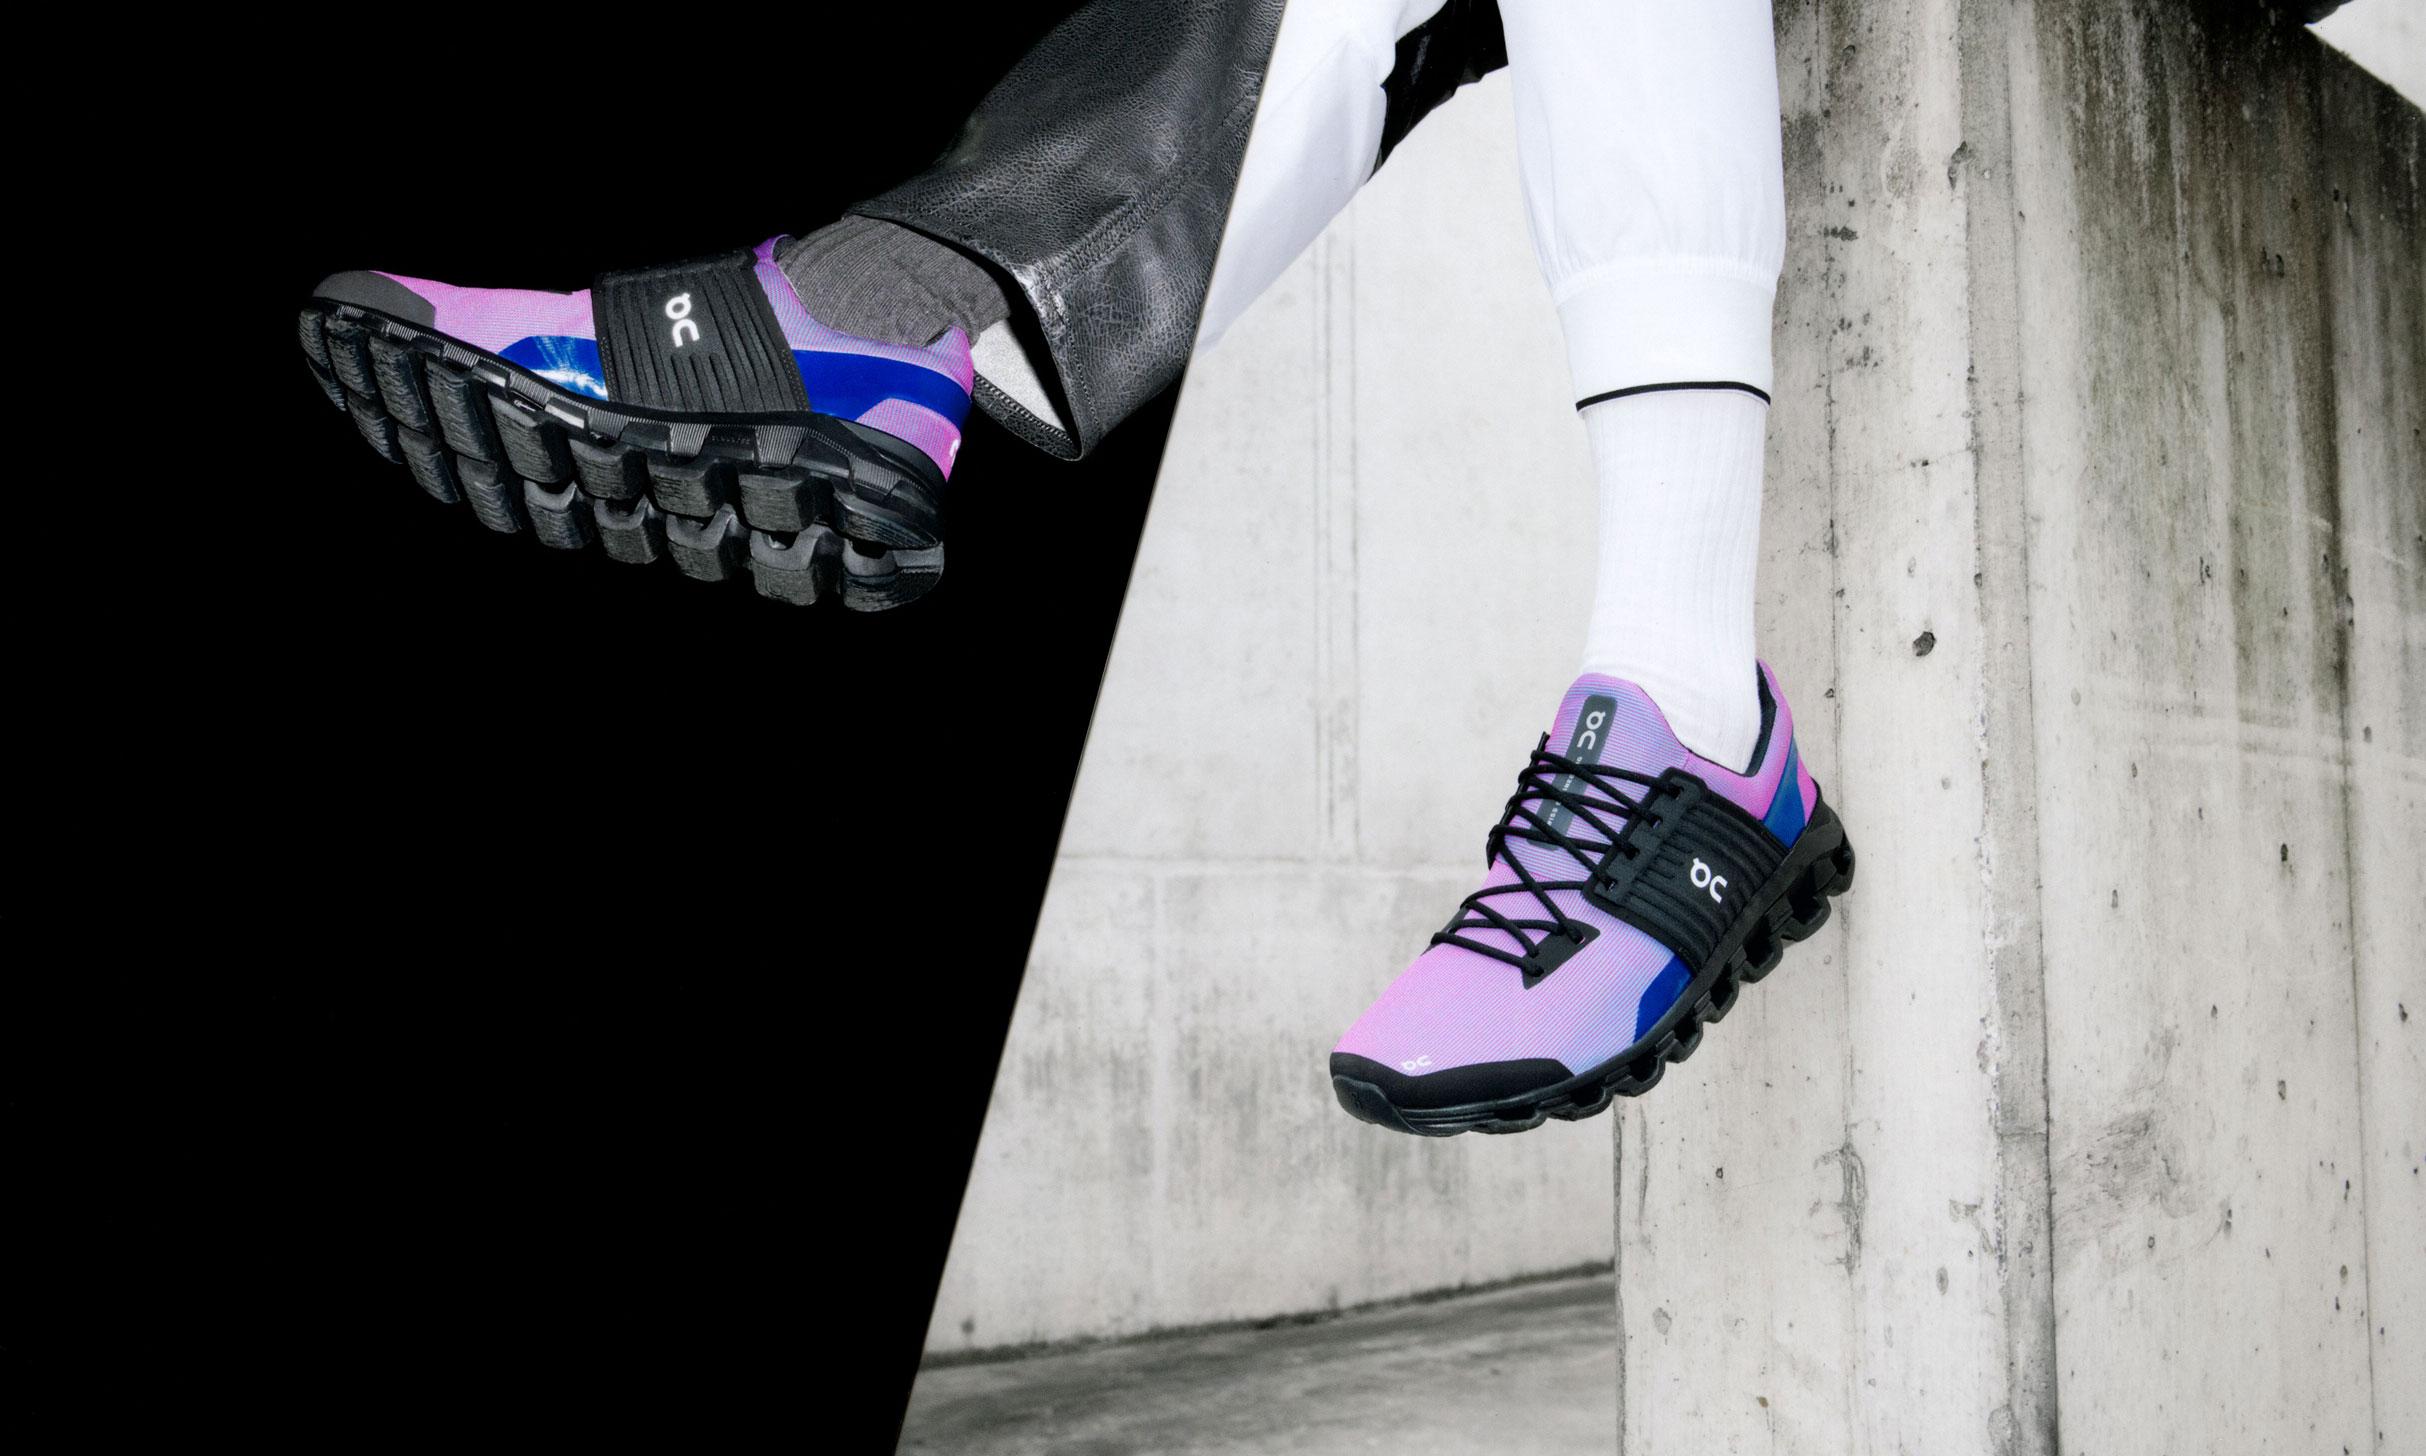 On 昂跑发布限量 Cloudswift Edge Prism 鞋款